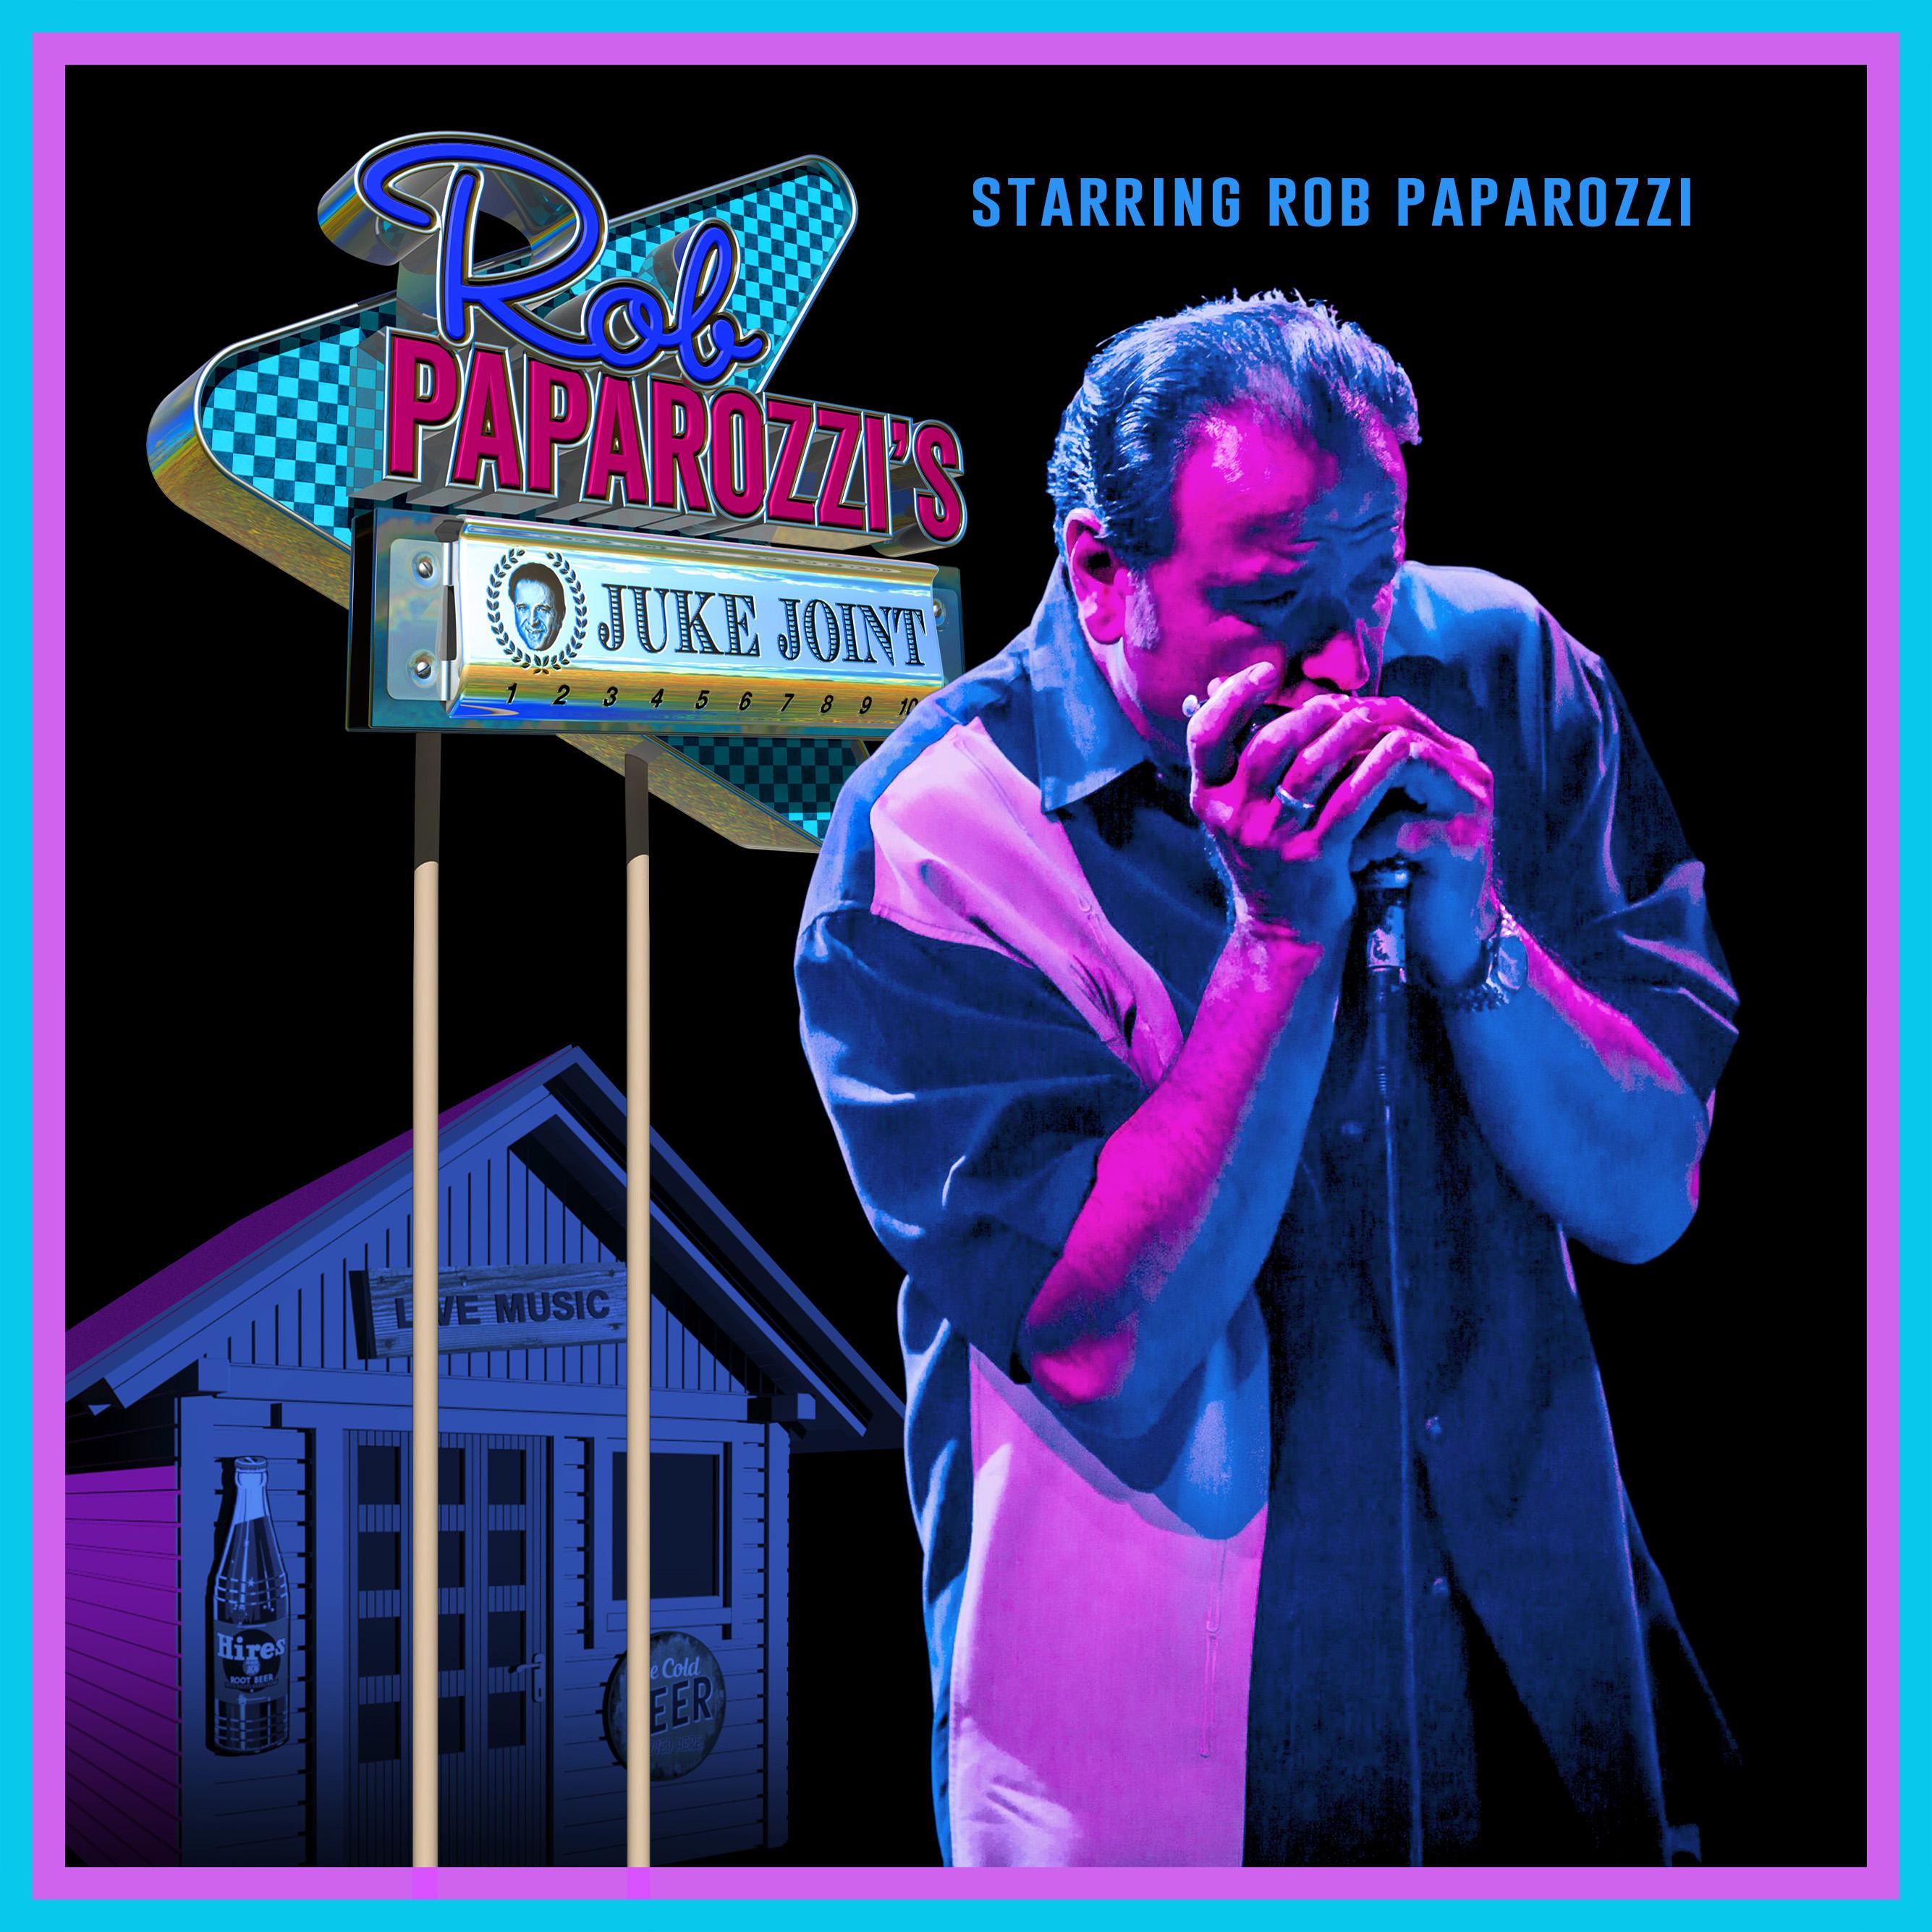 Rob Paparozzi's Juke Joint Poster